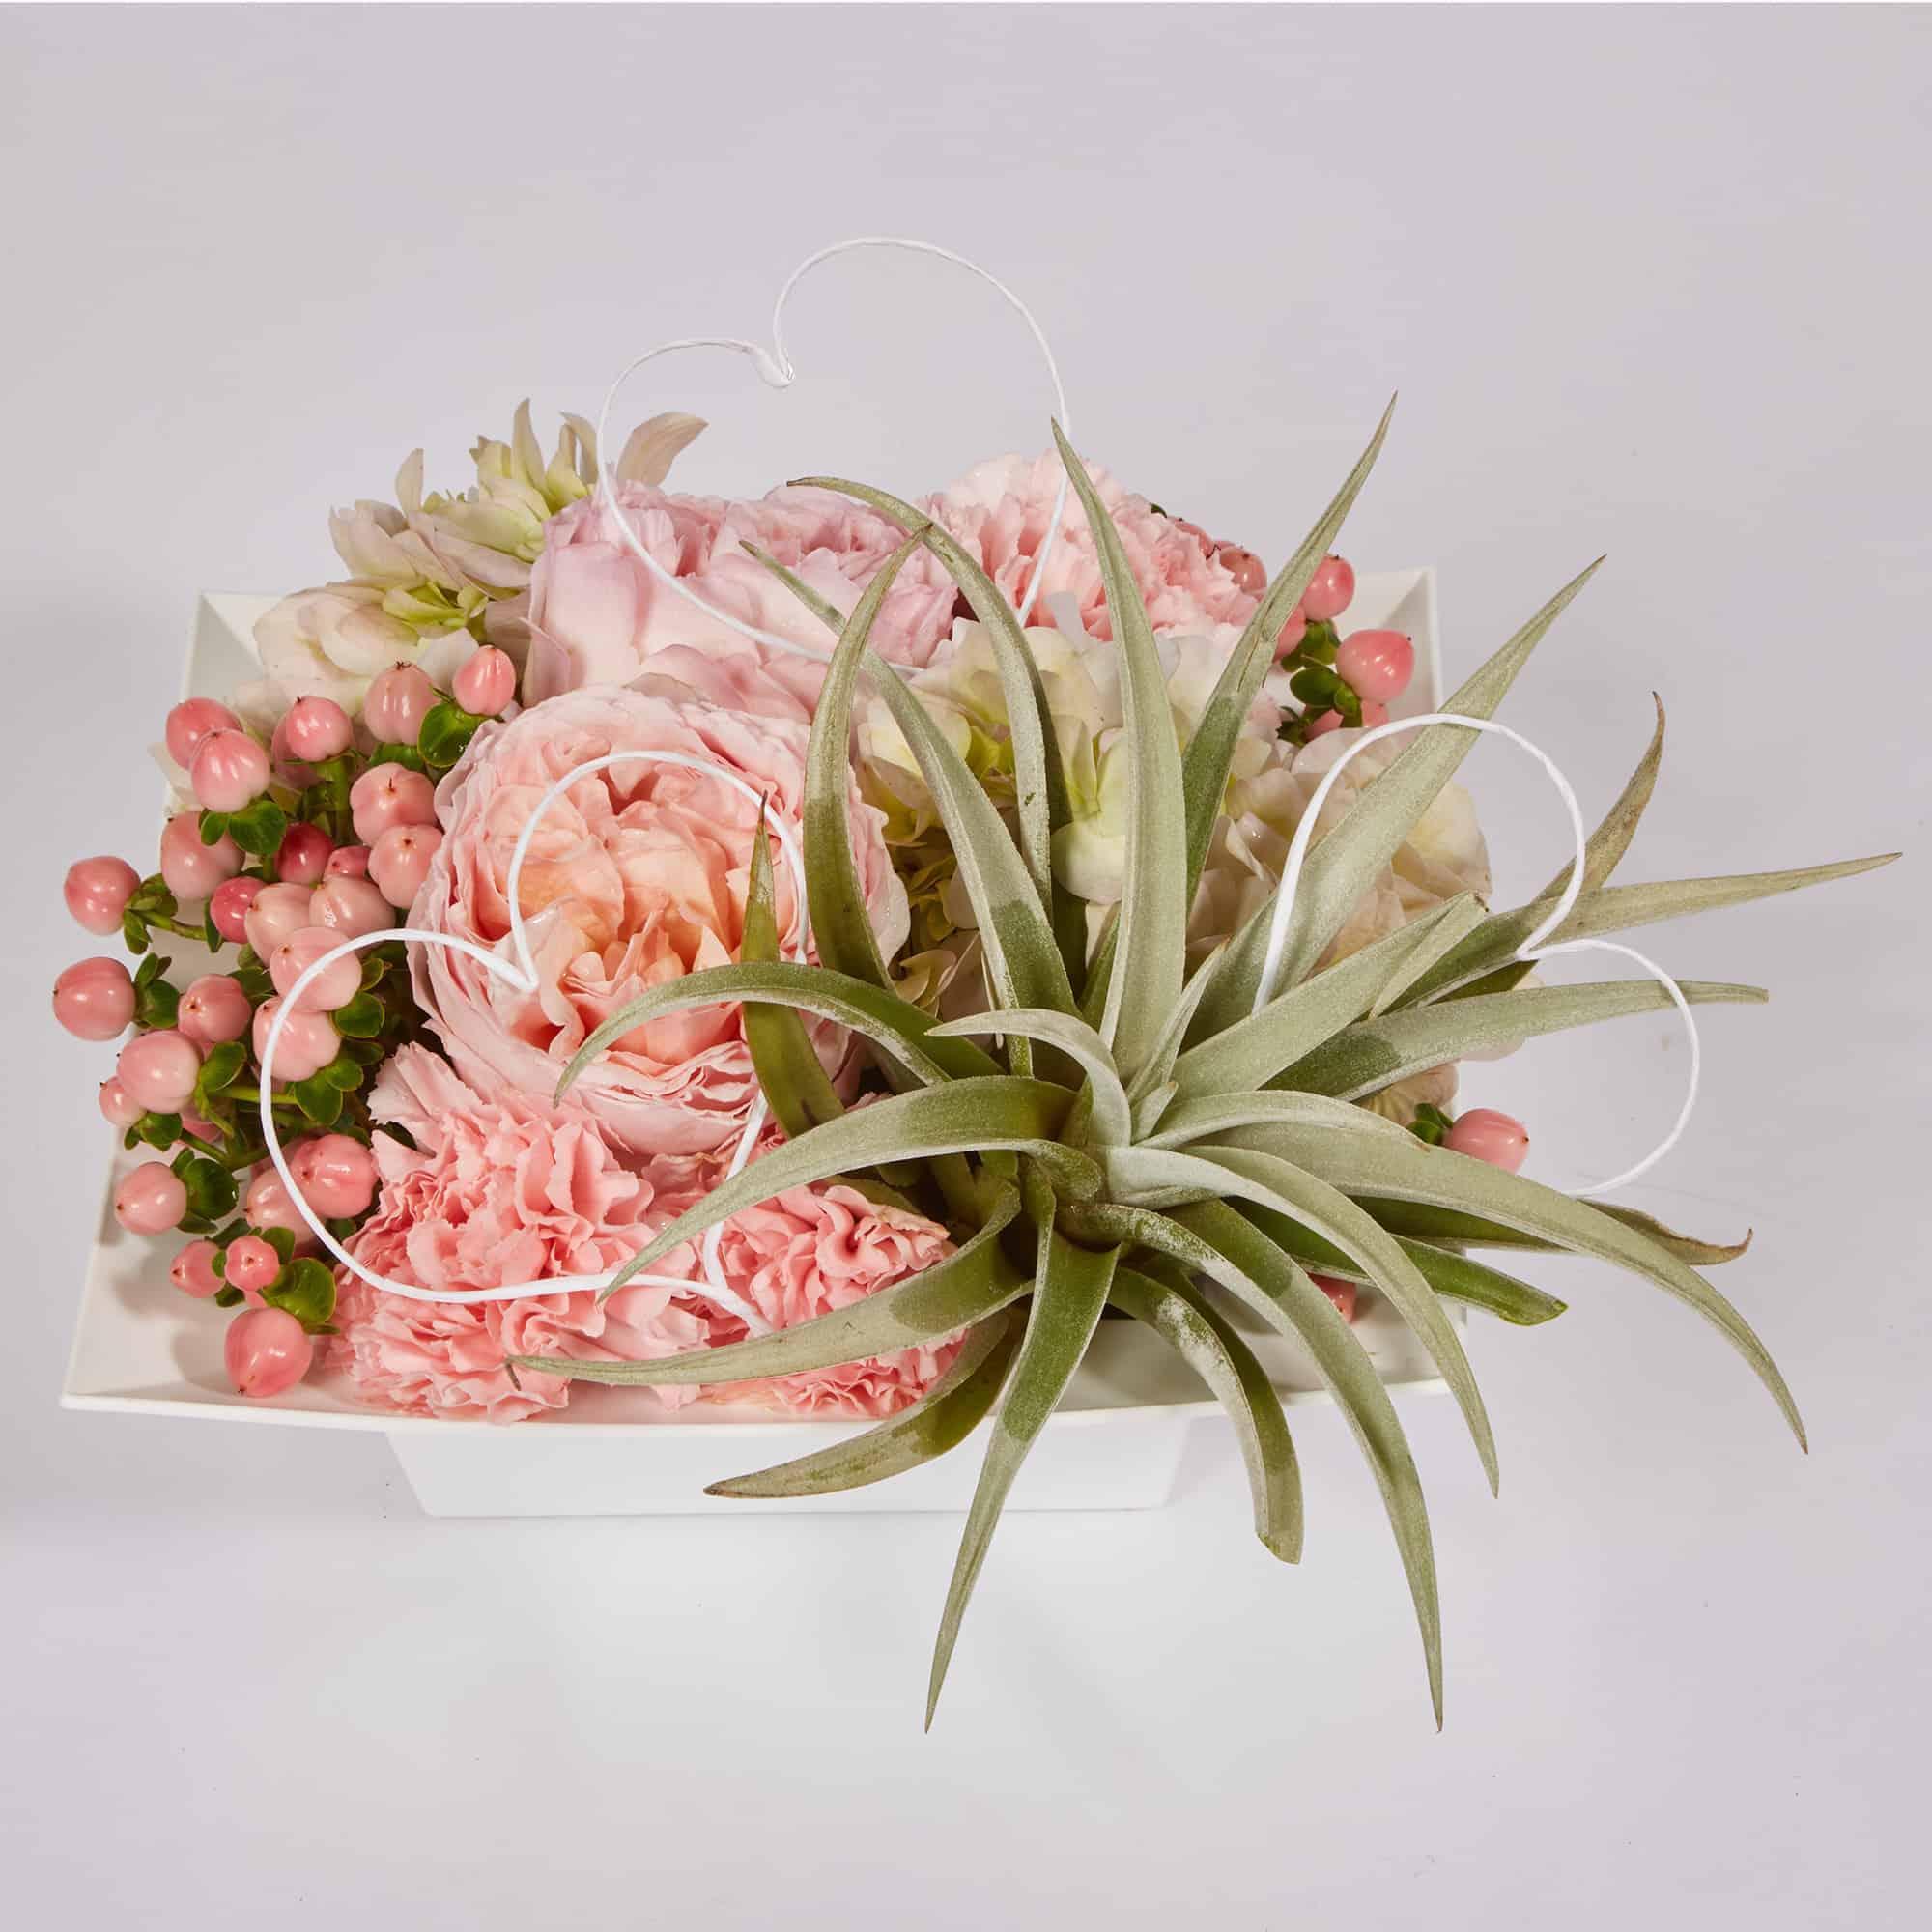 Quadruple Pink Floral Valentine